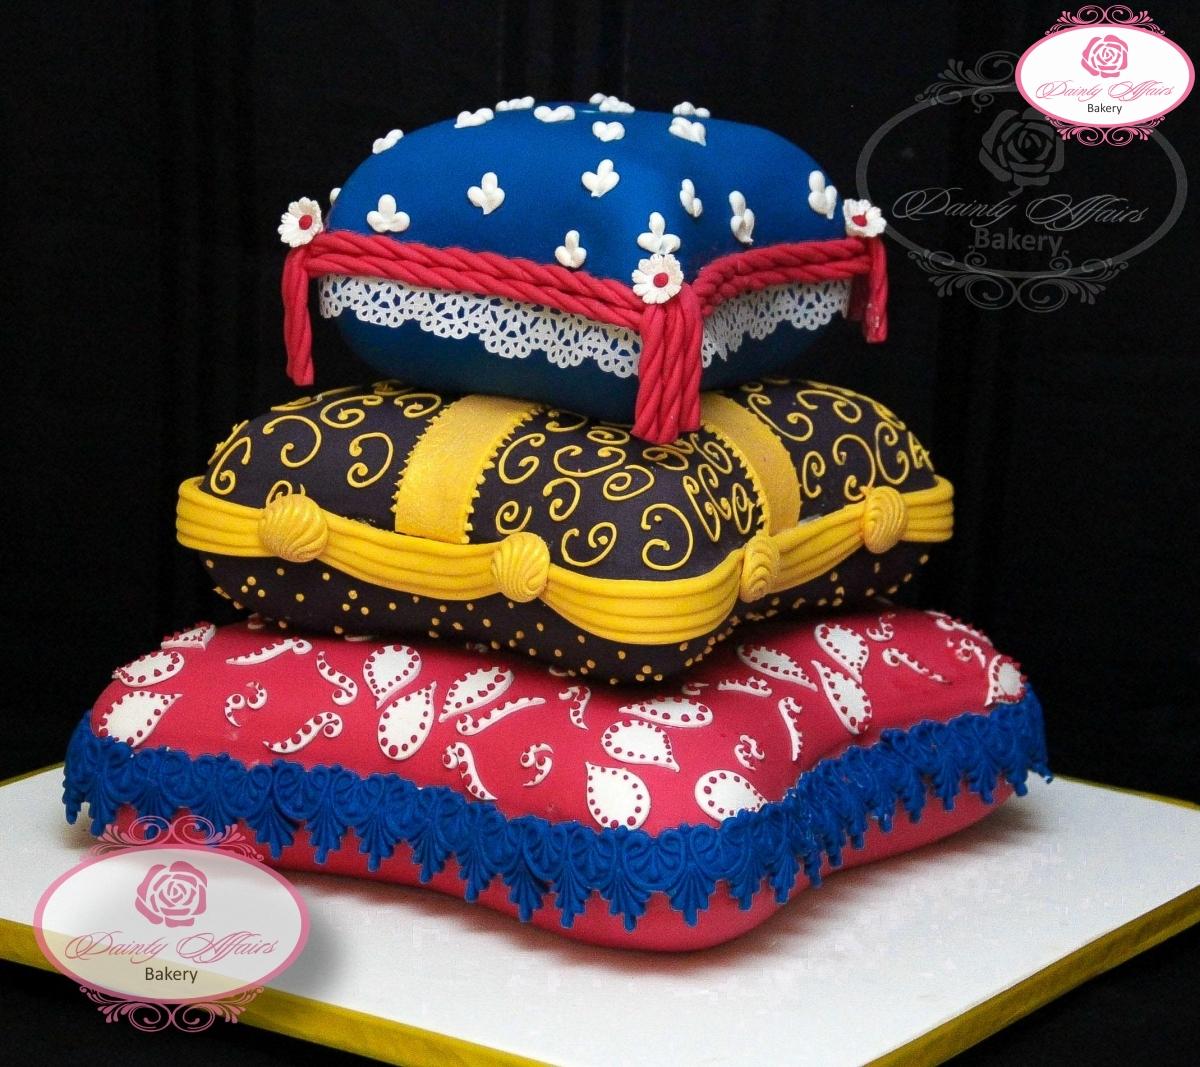 Traditional Wedding Cakes Dainty Affairs Bakery